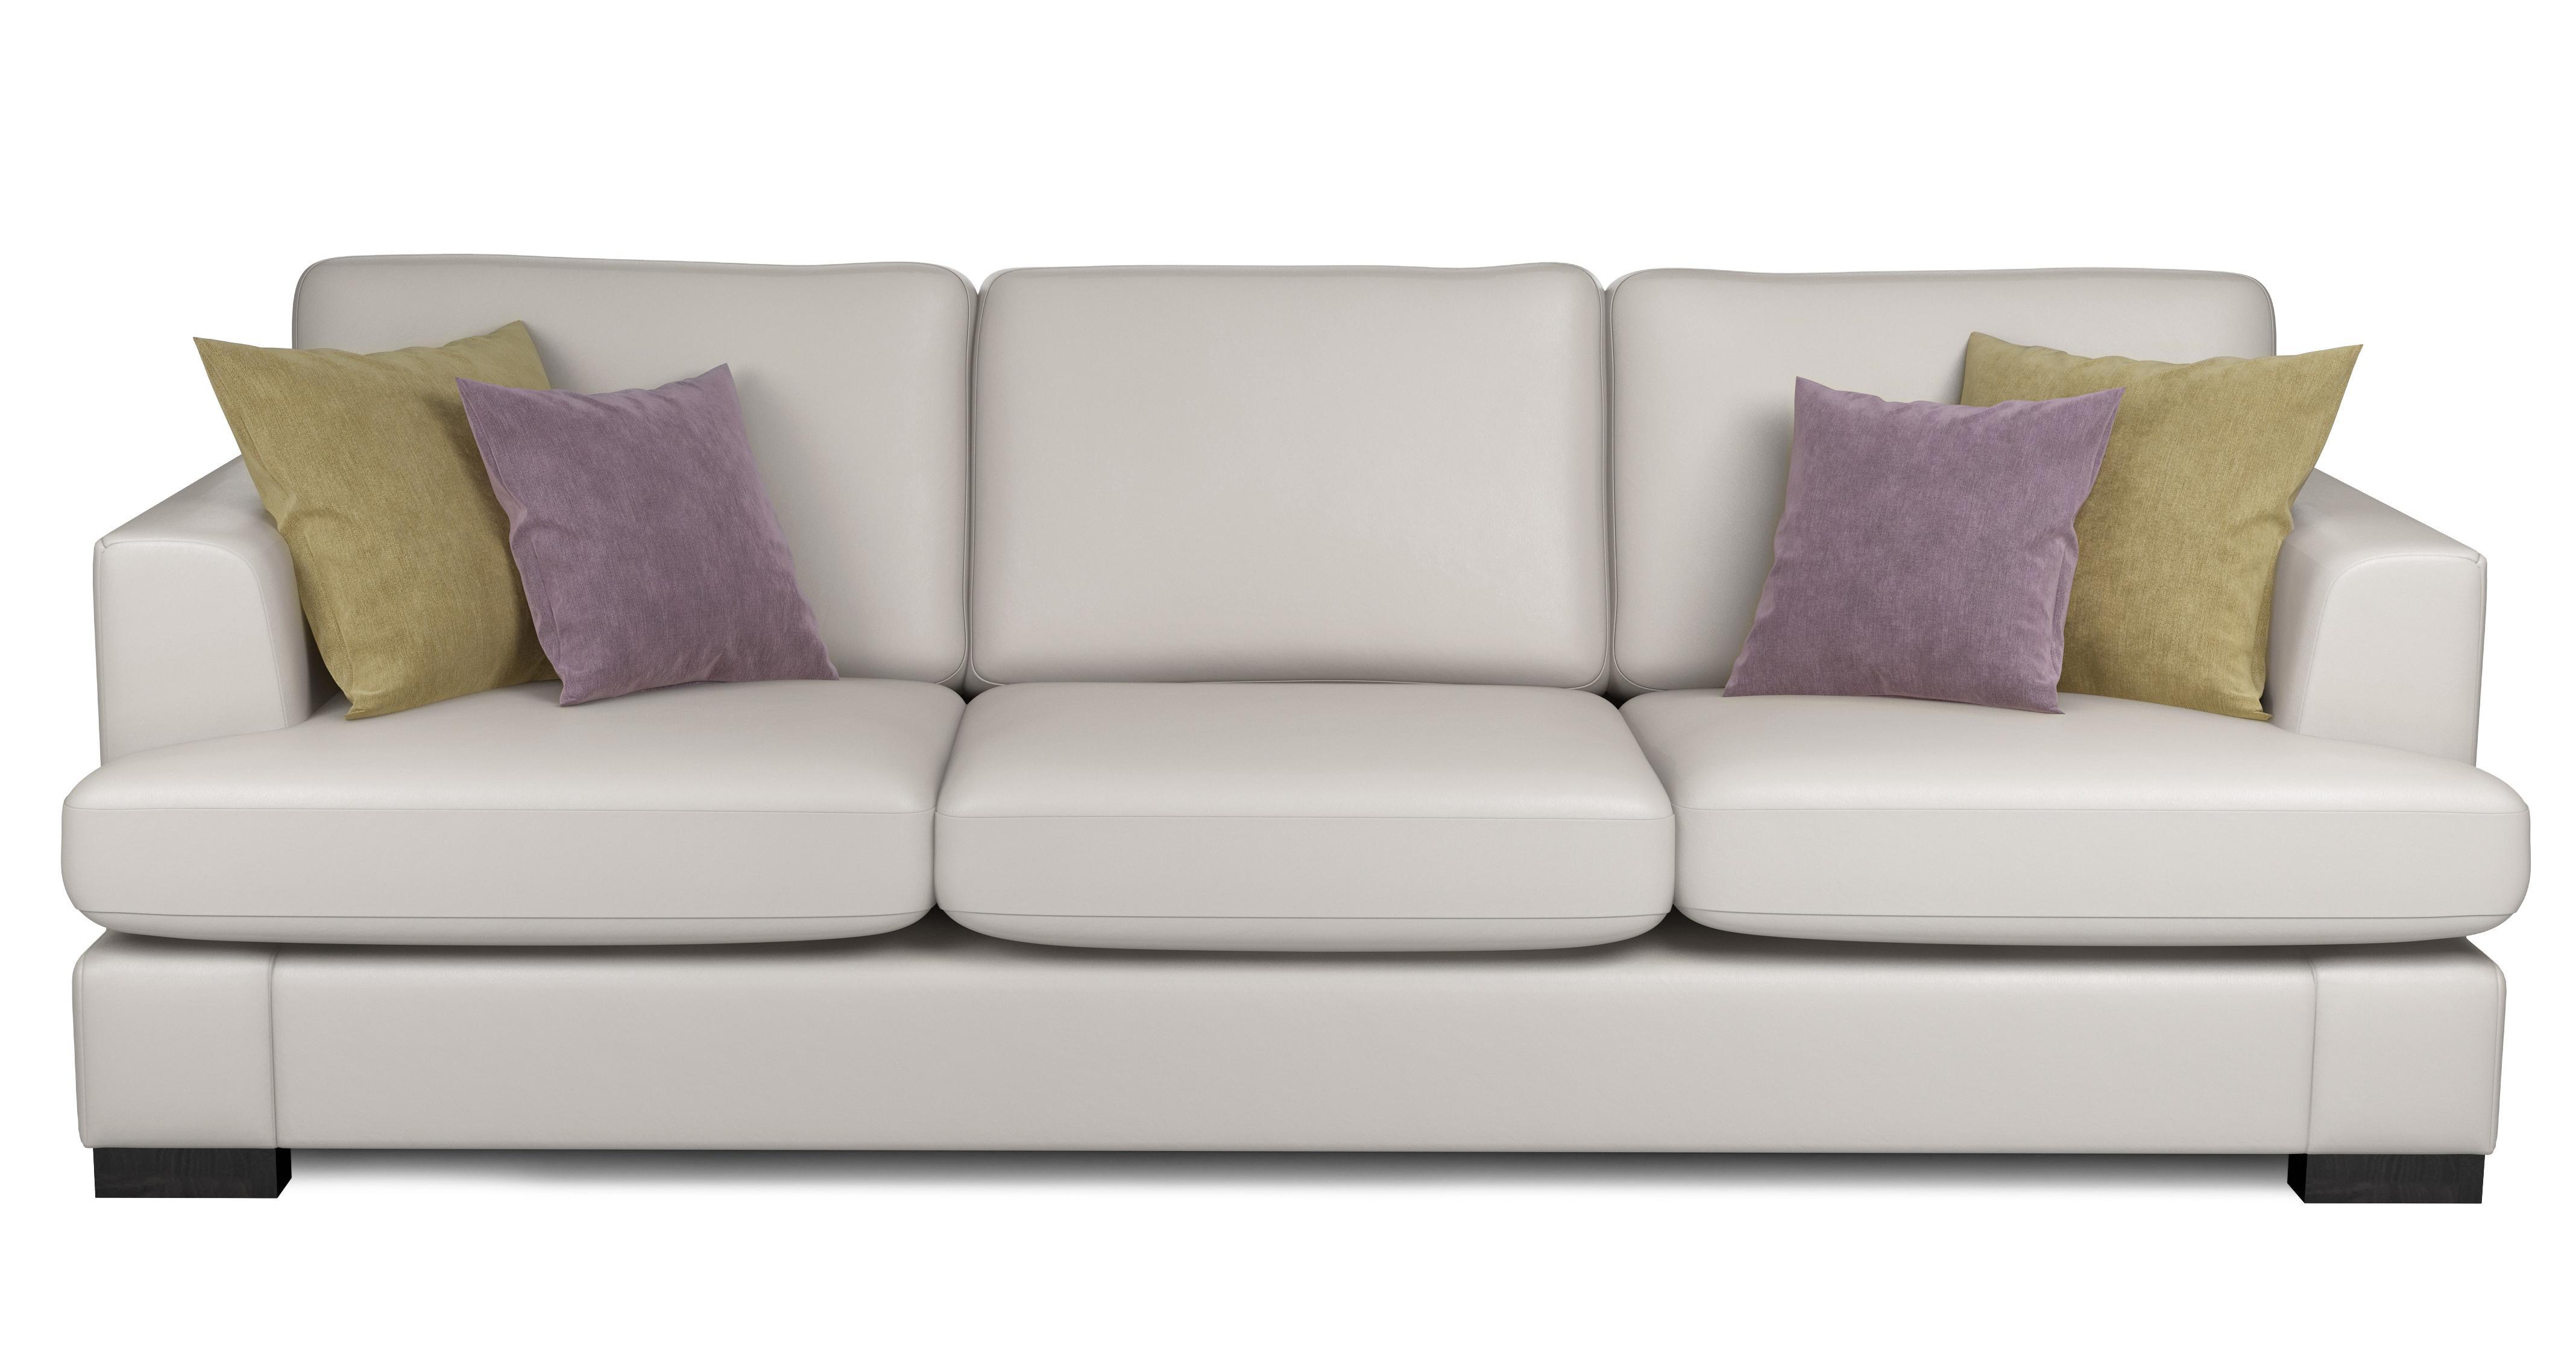 Freya Leather 4 Seater Sofa Beau DFS